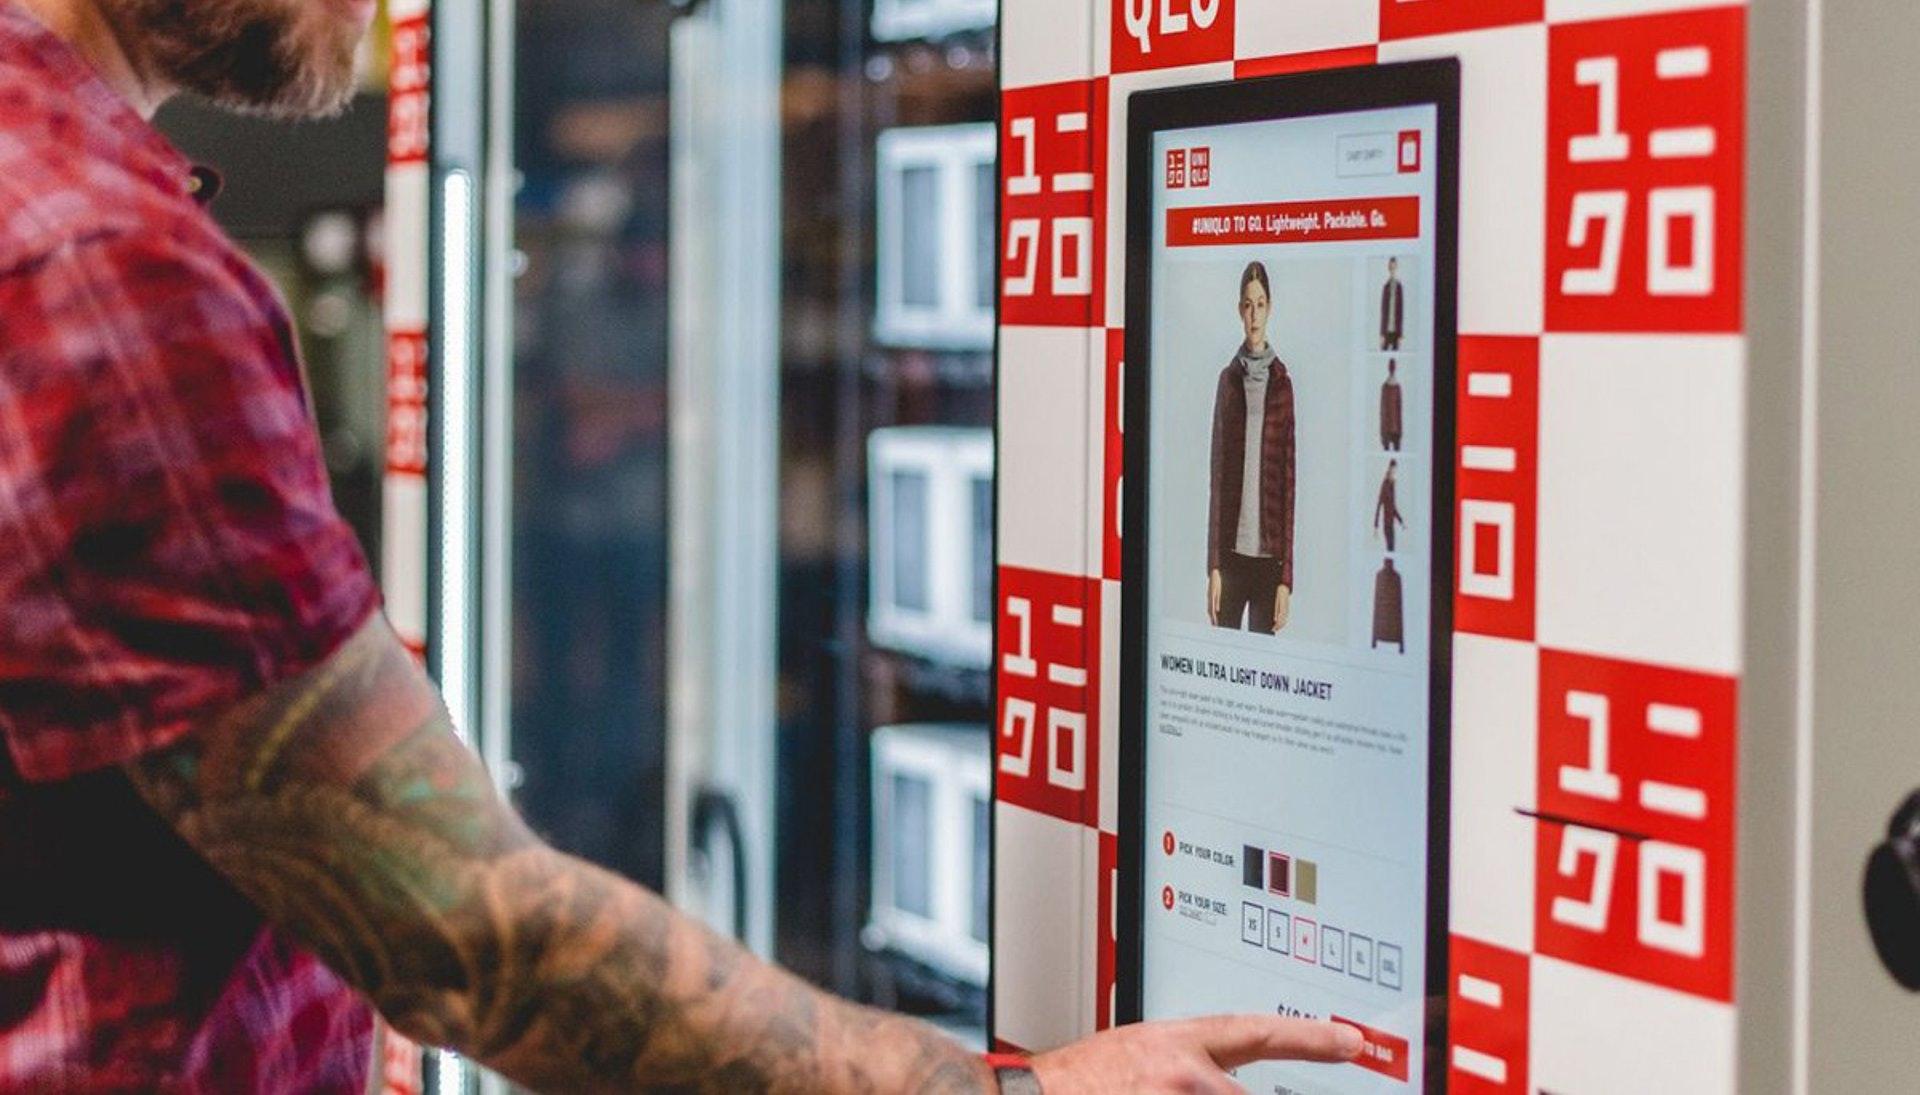 USA-San Francisco 샌프란시스코다운 자판기: The World News (9)